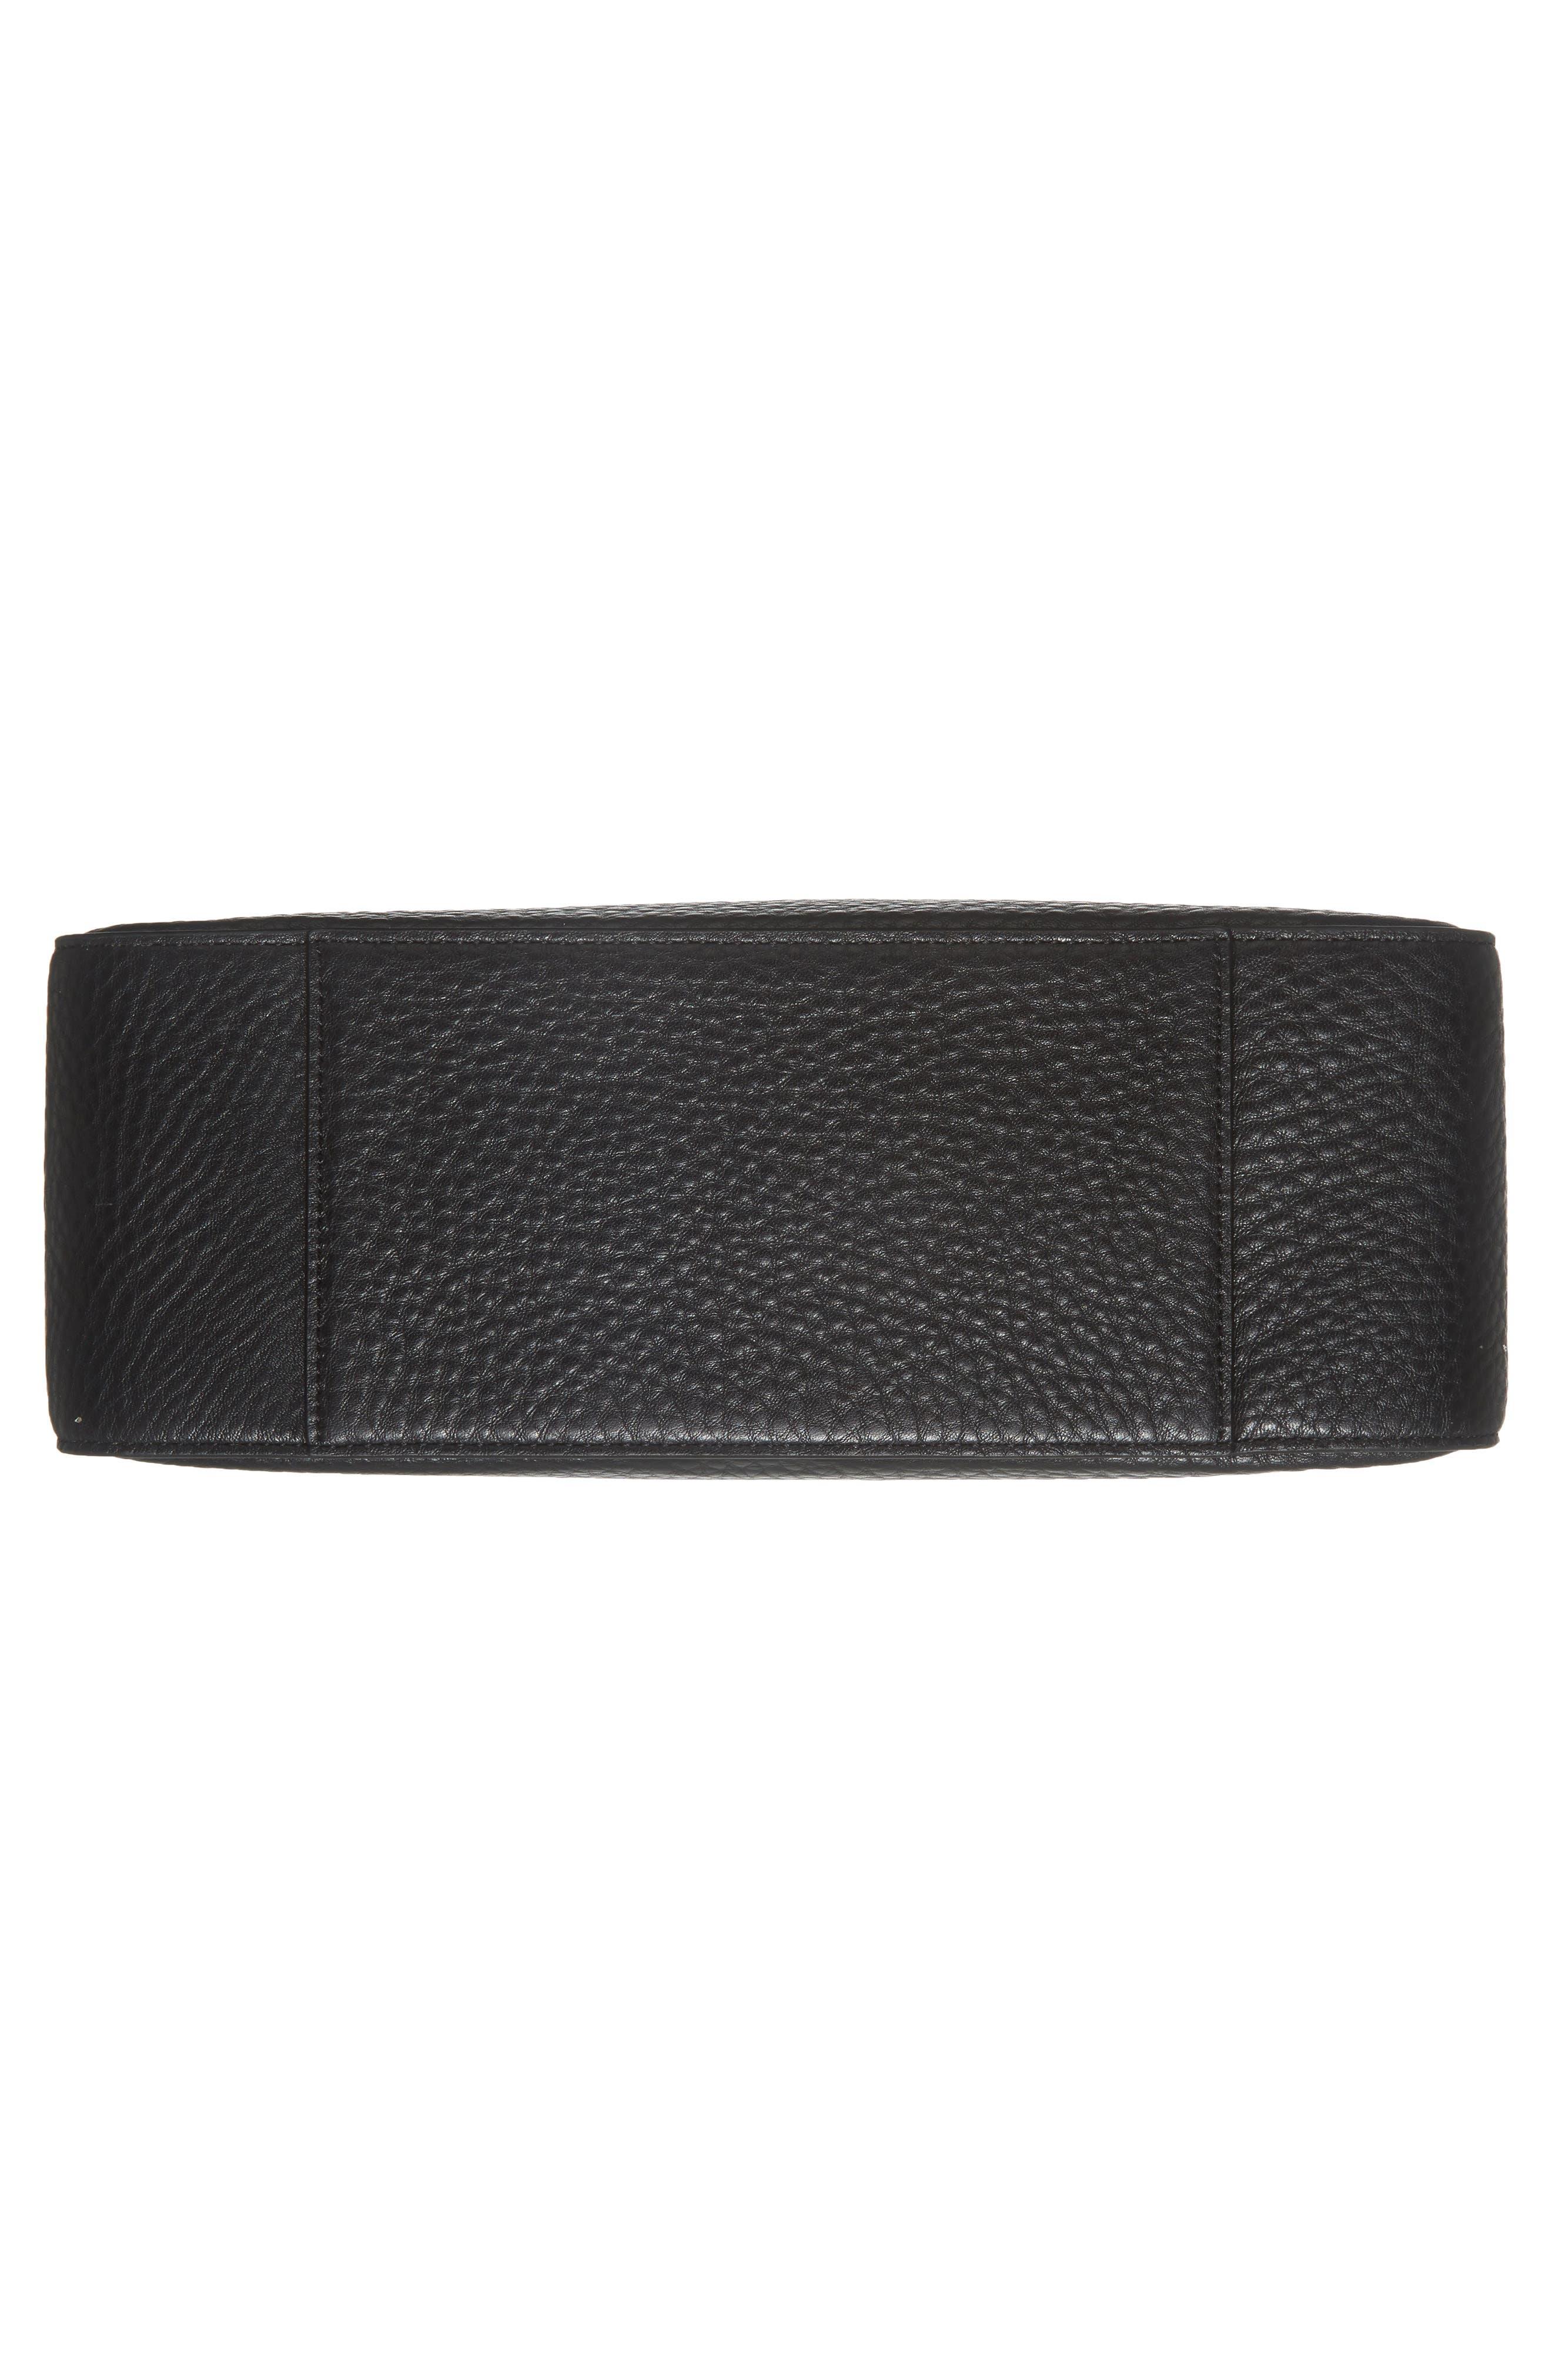 stewart street lynea leather satchel,                             Alternate thumbnail 6, color,                             001